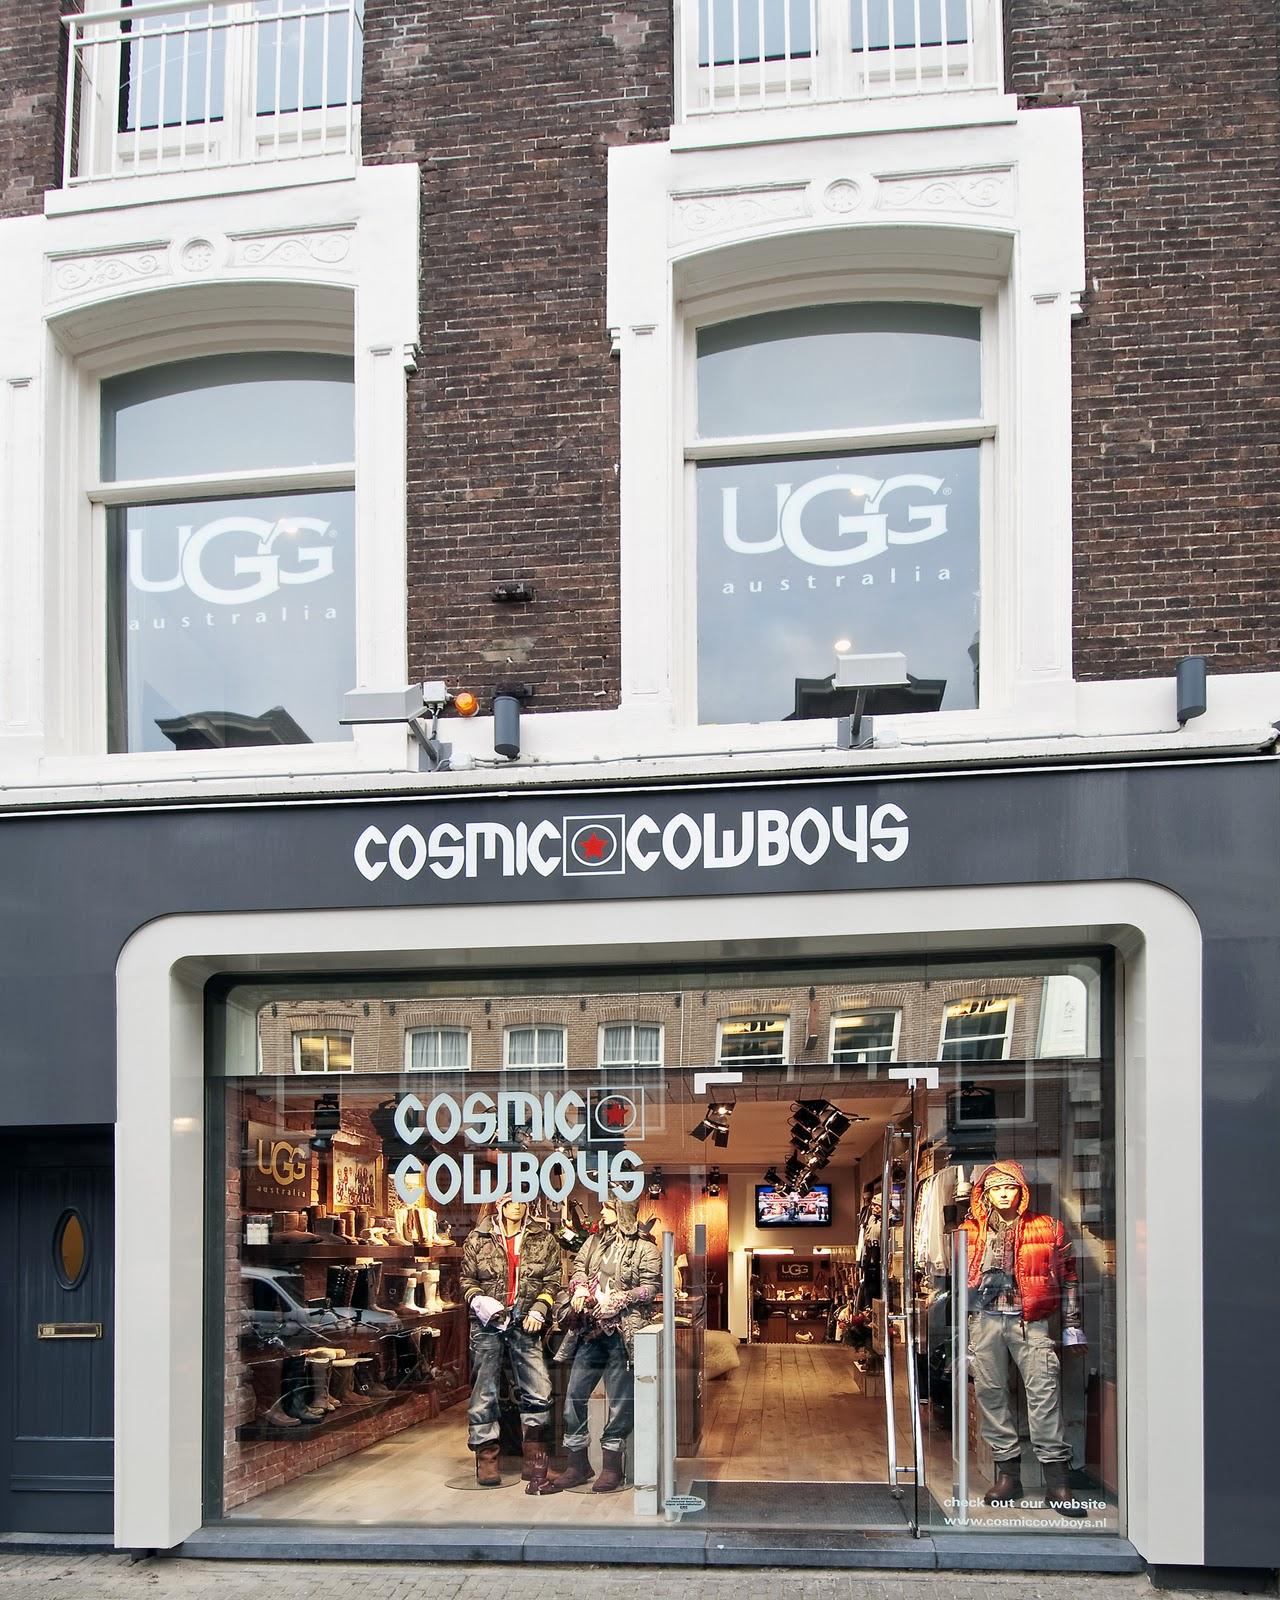 ugg store amsterdam pc hooftstraat